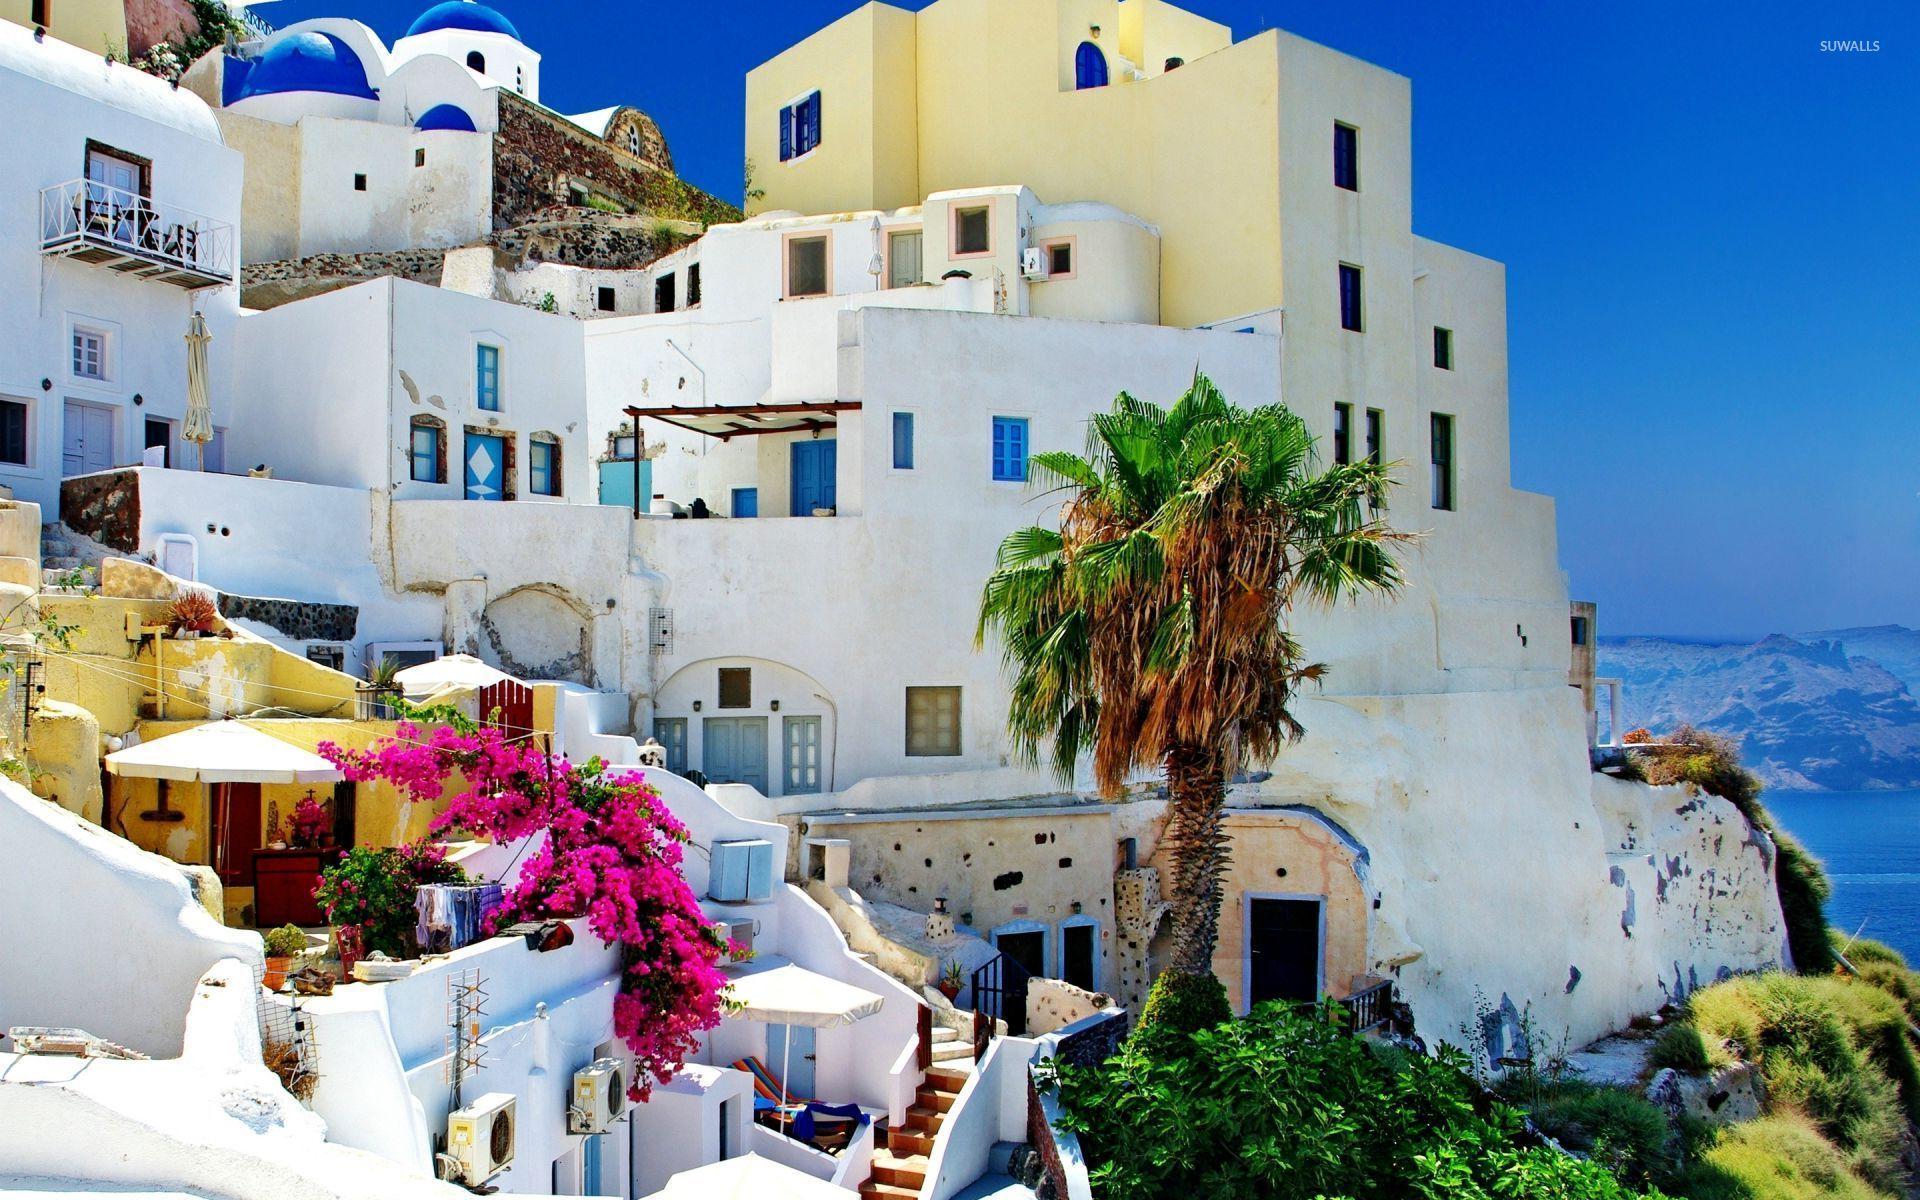 greece wallpapers santorini hd - photo #36